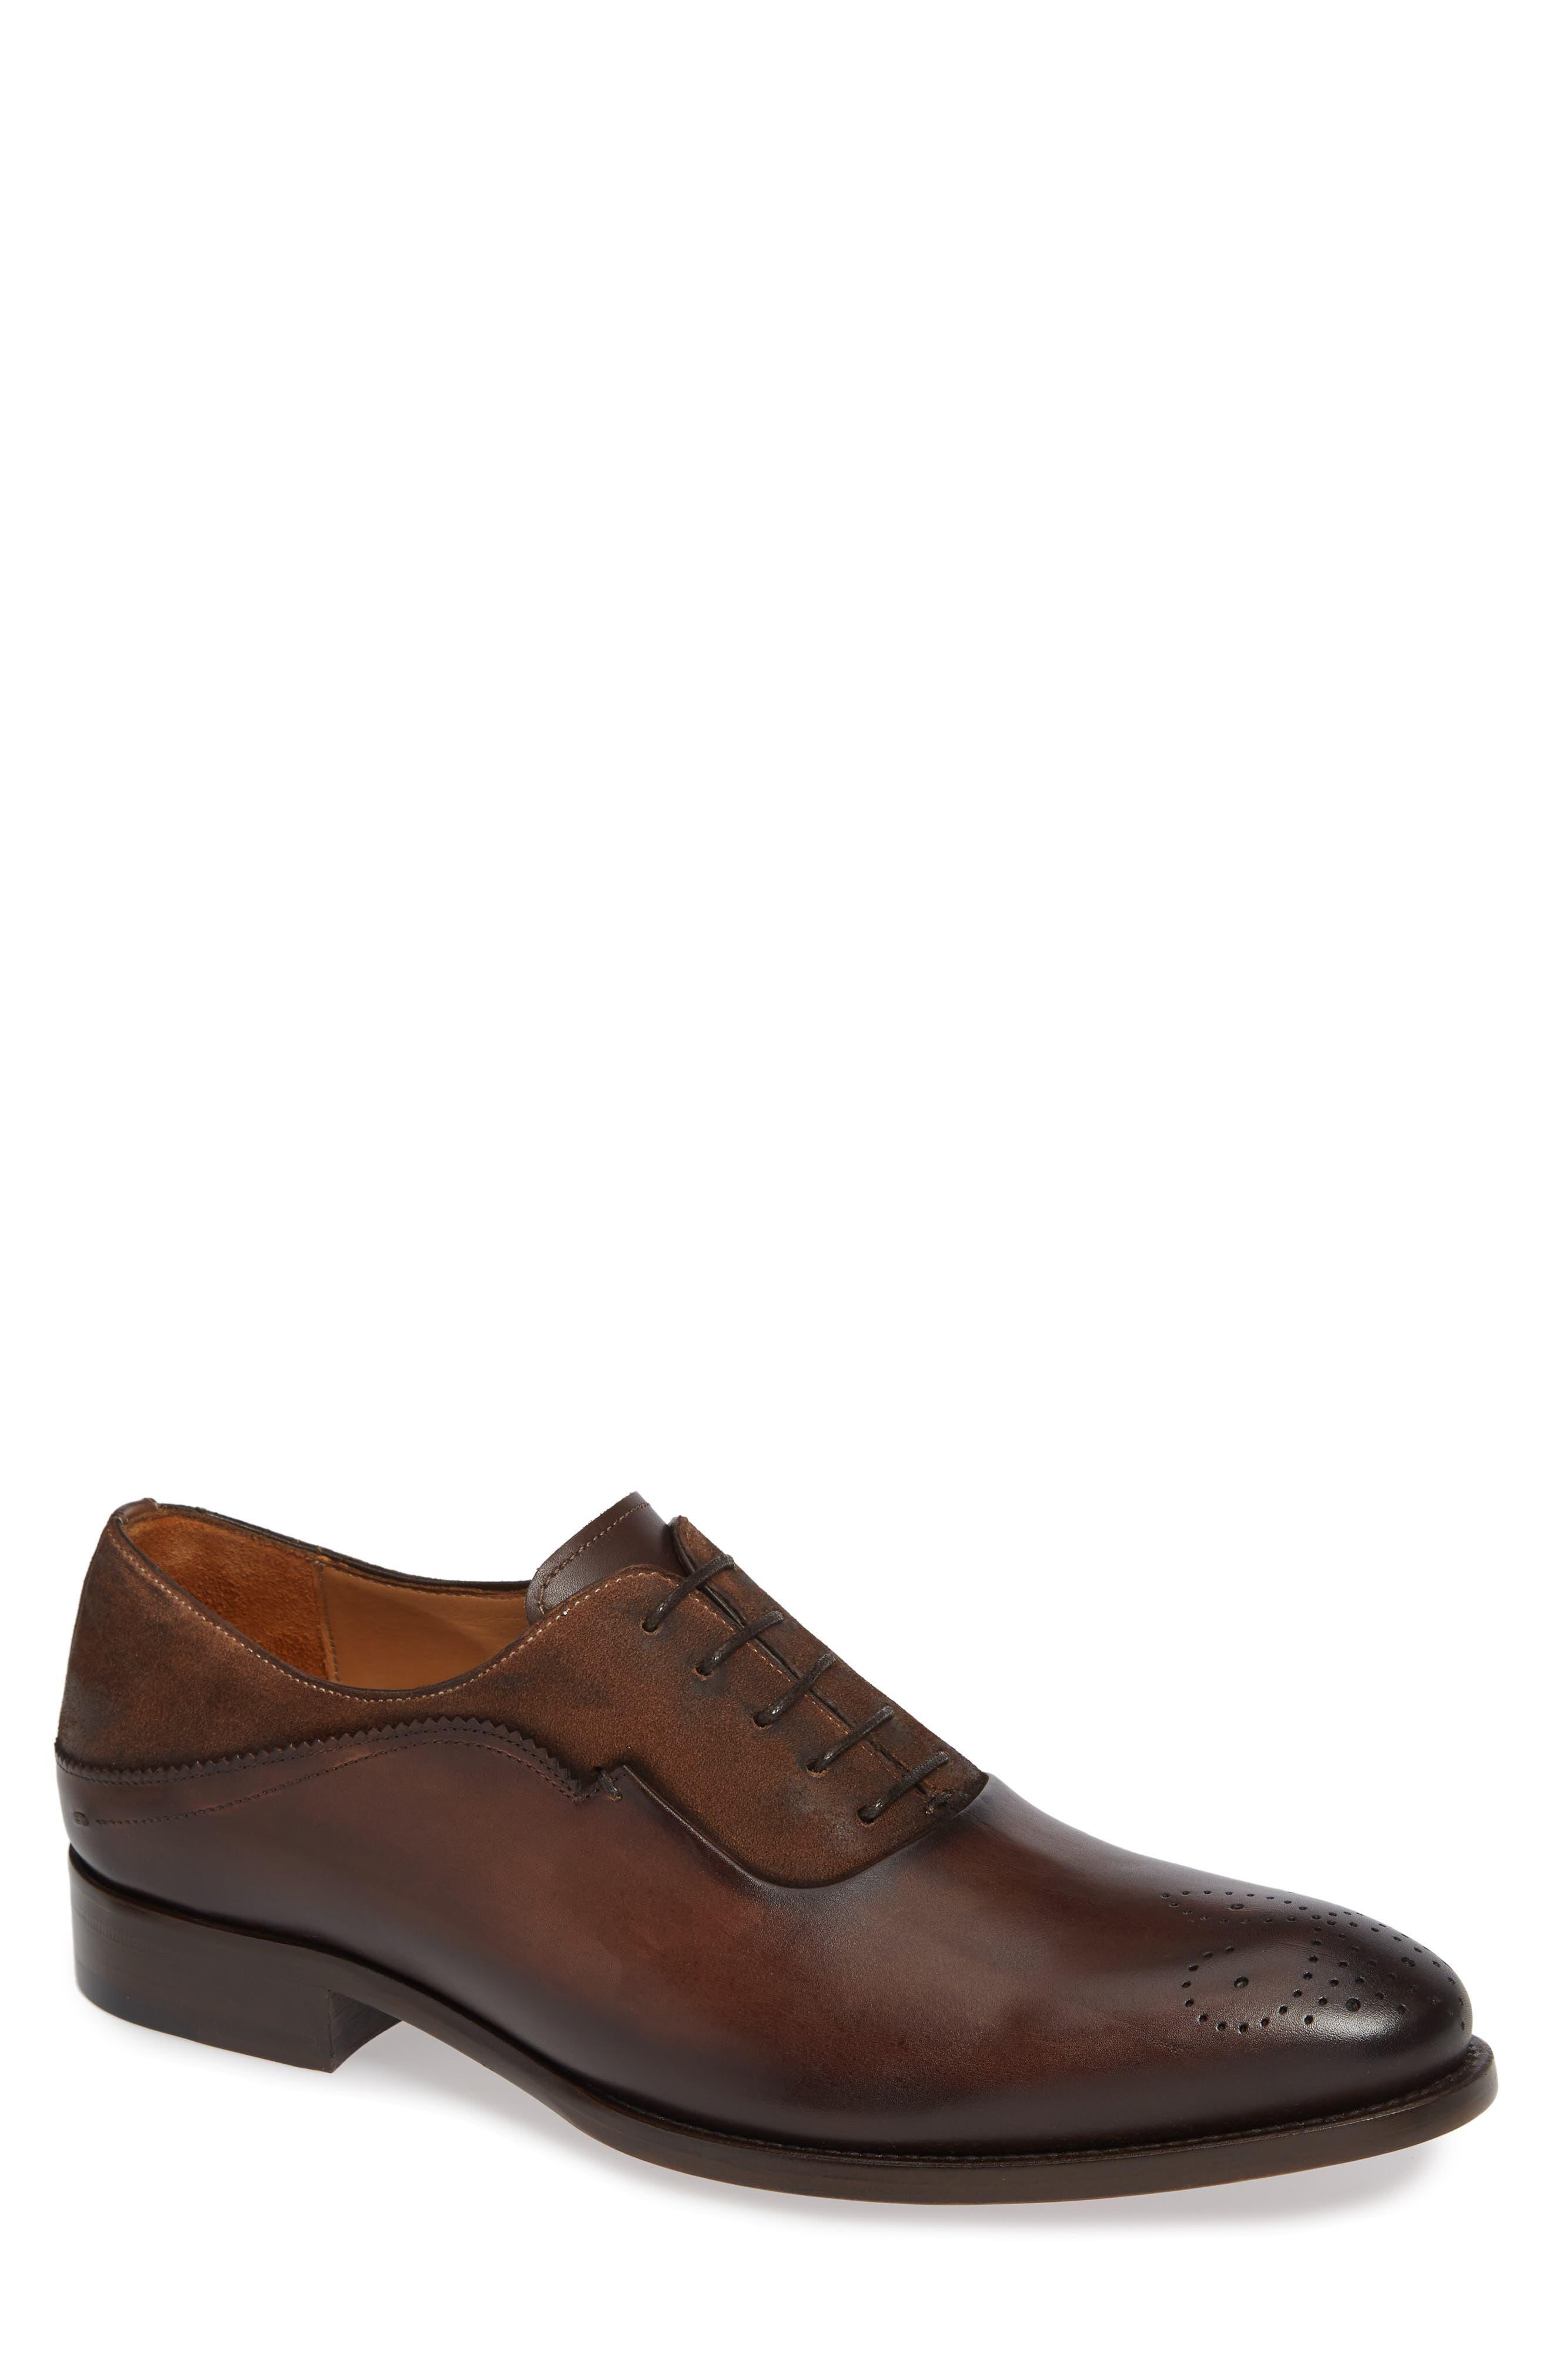 Mezlan Hanks Longwing Oxford, Brown